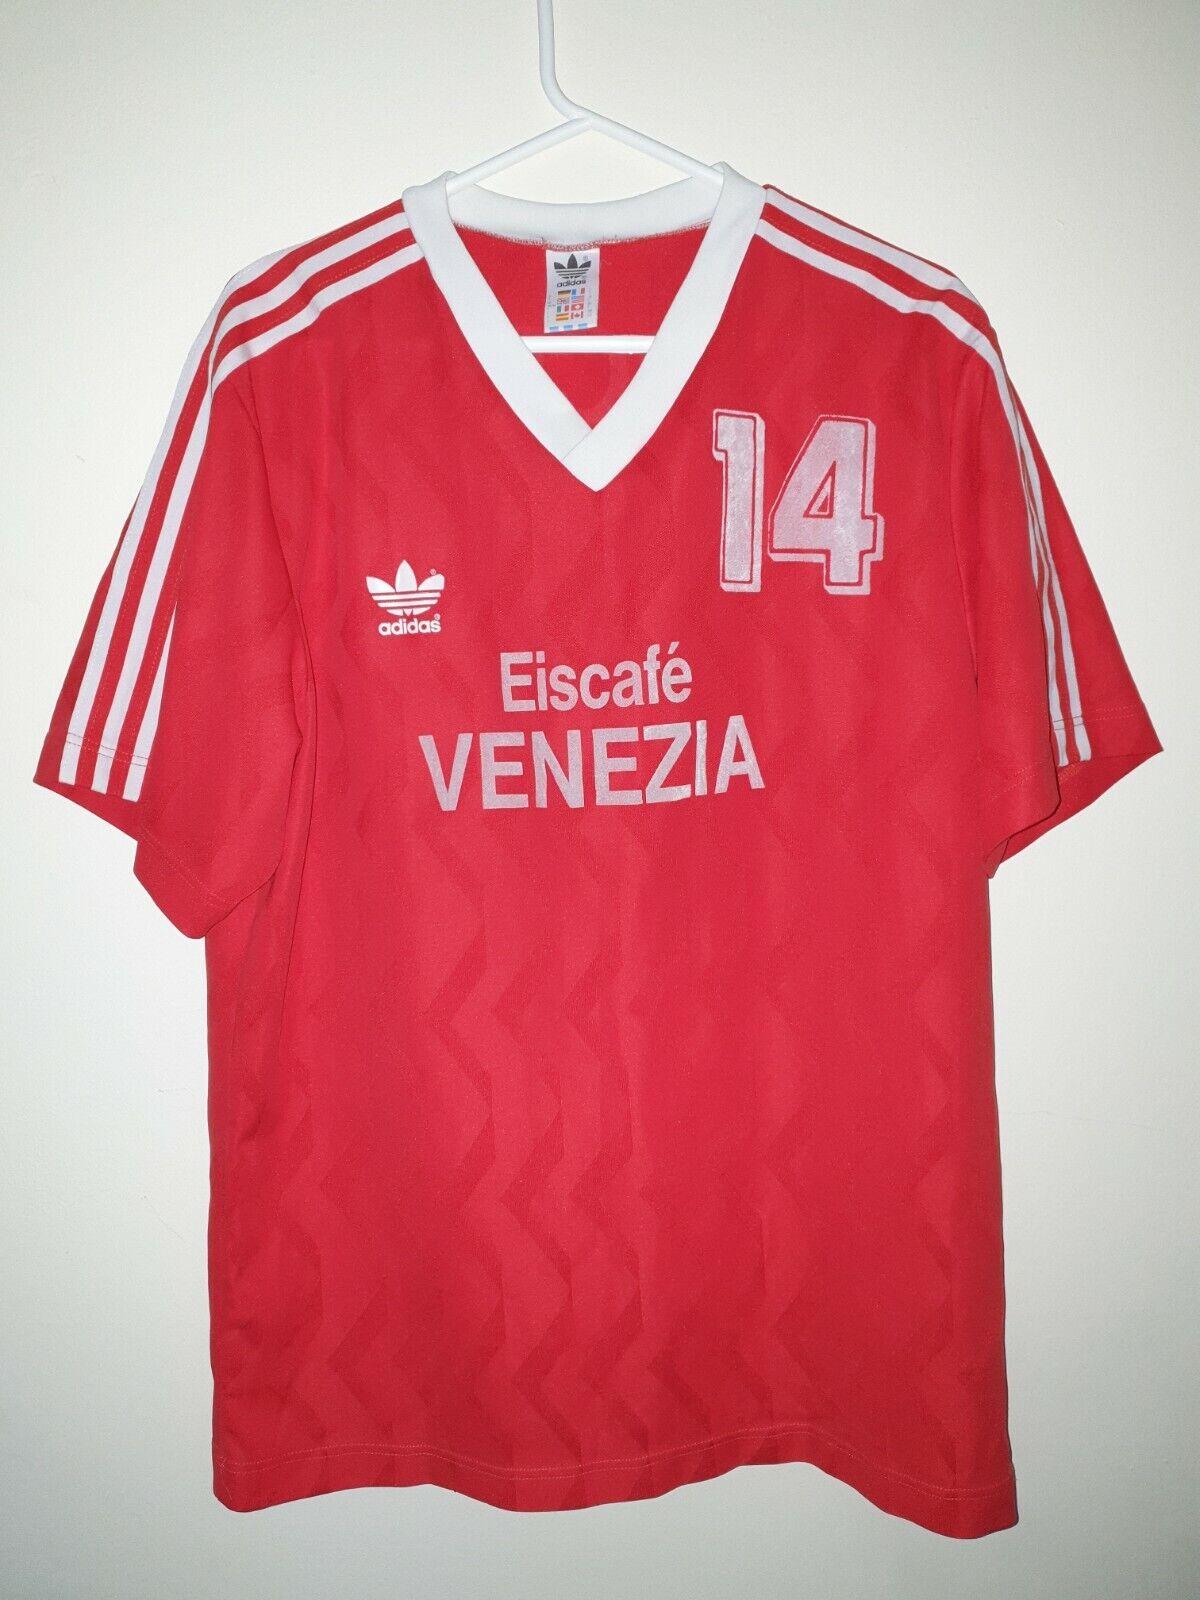 Adidas vintage 1980'S handball shirt 80's retro #14 jersey trefoil Bulgaria (XL)